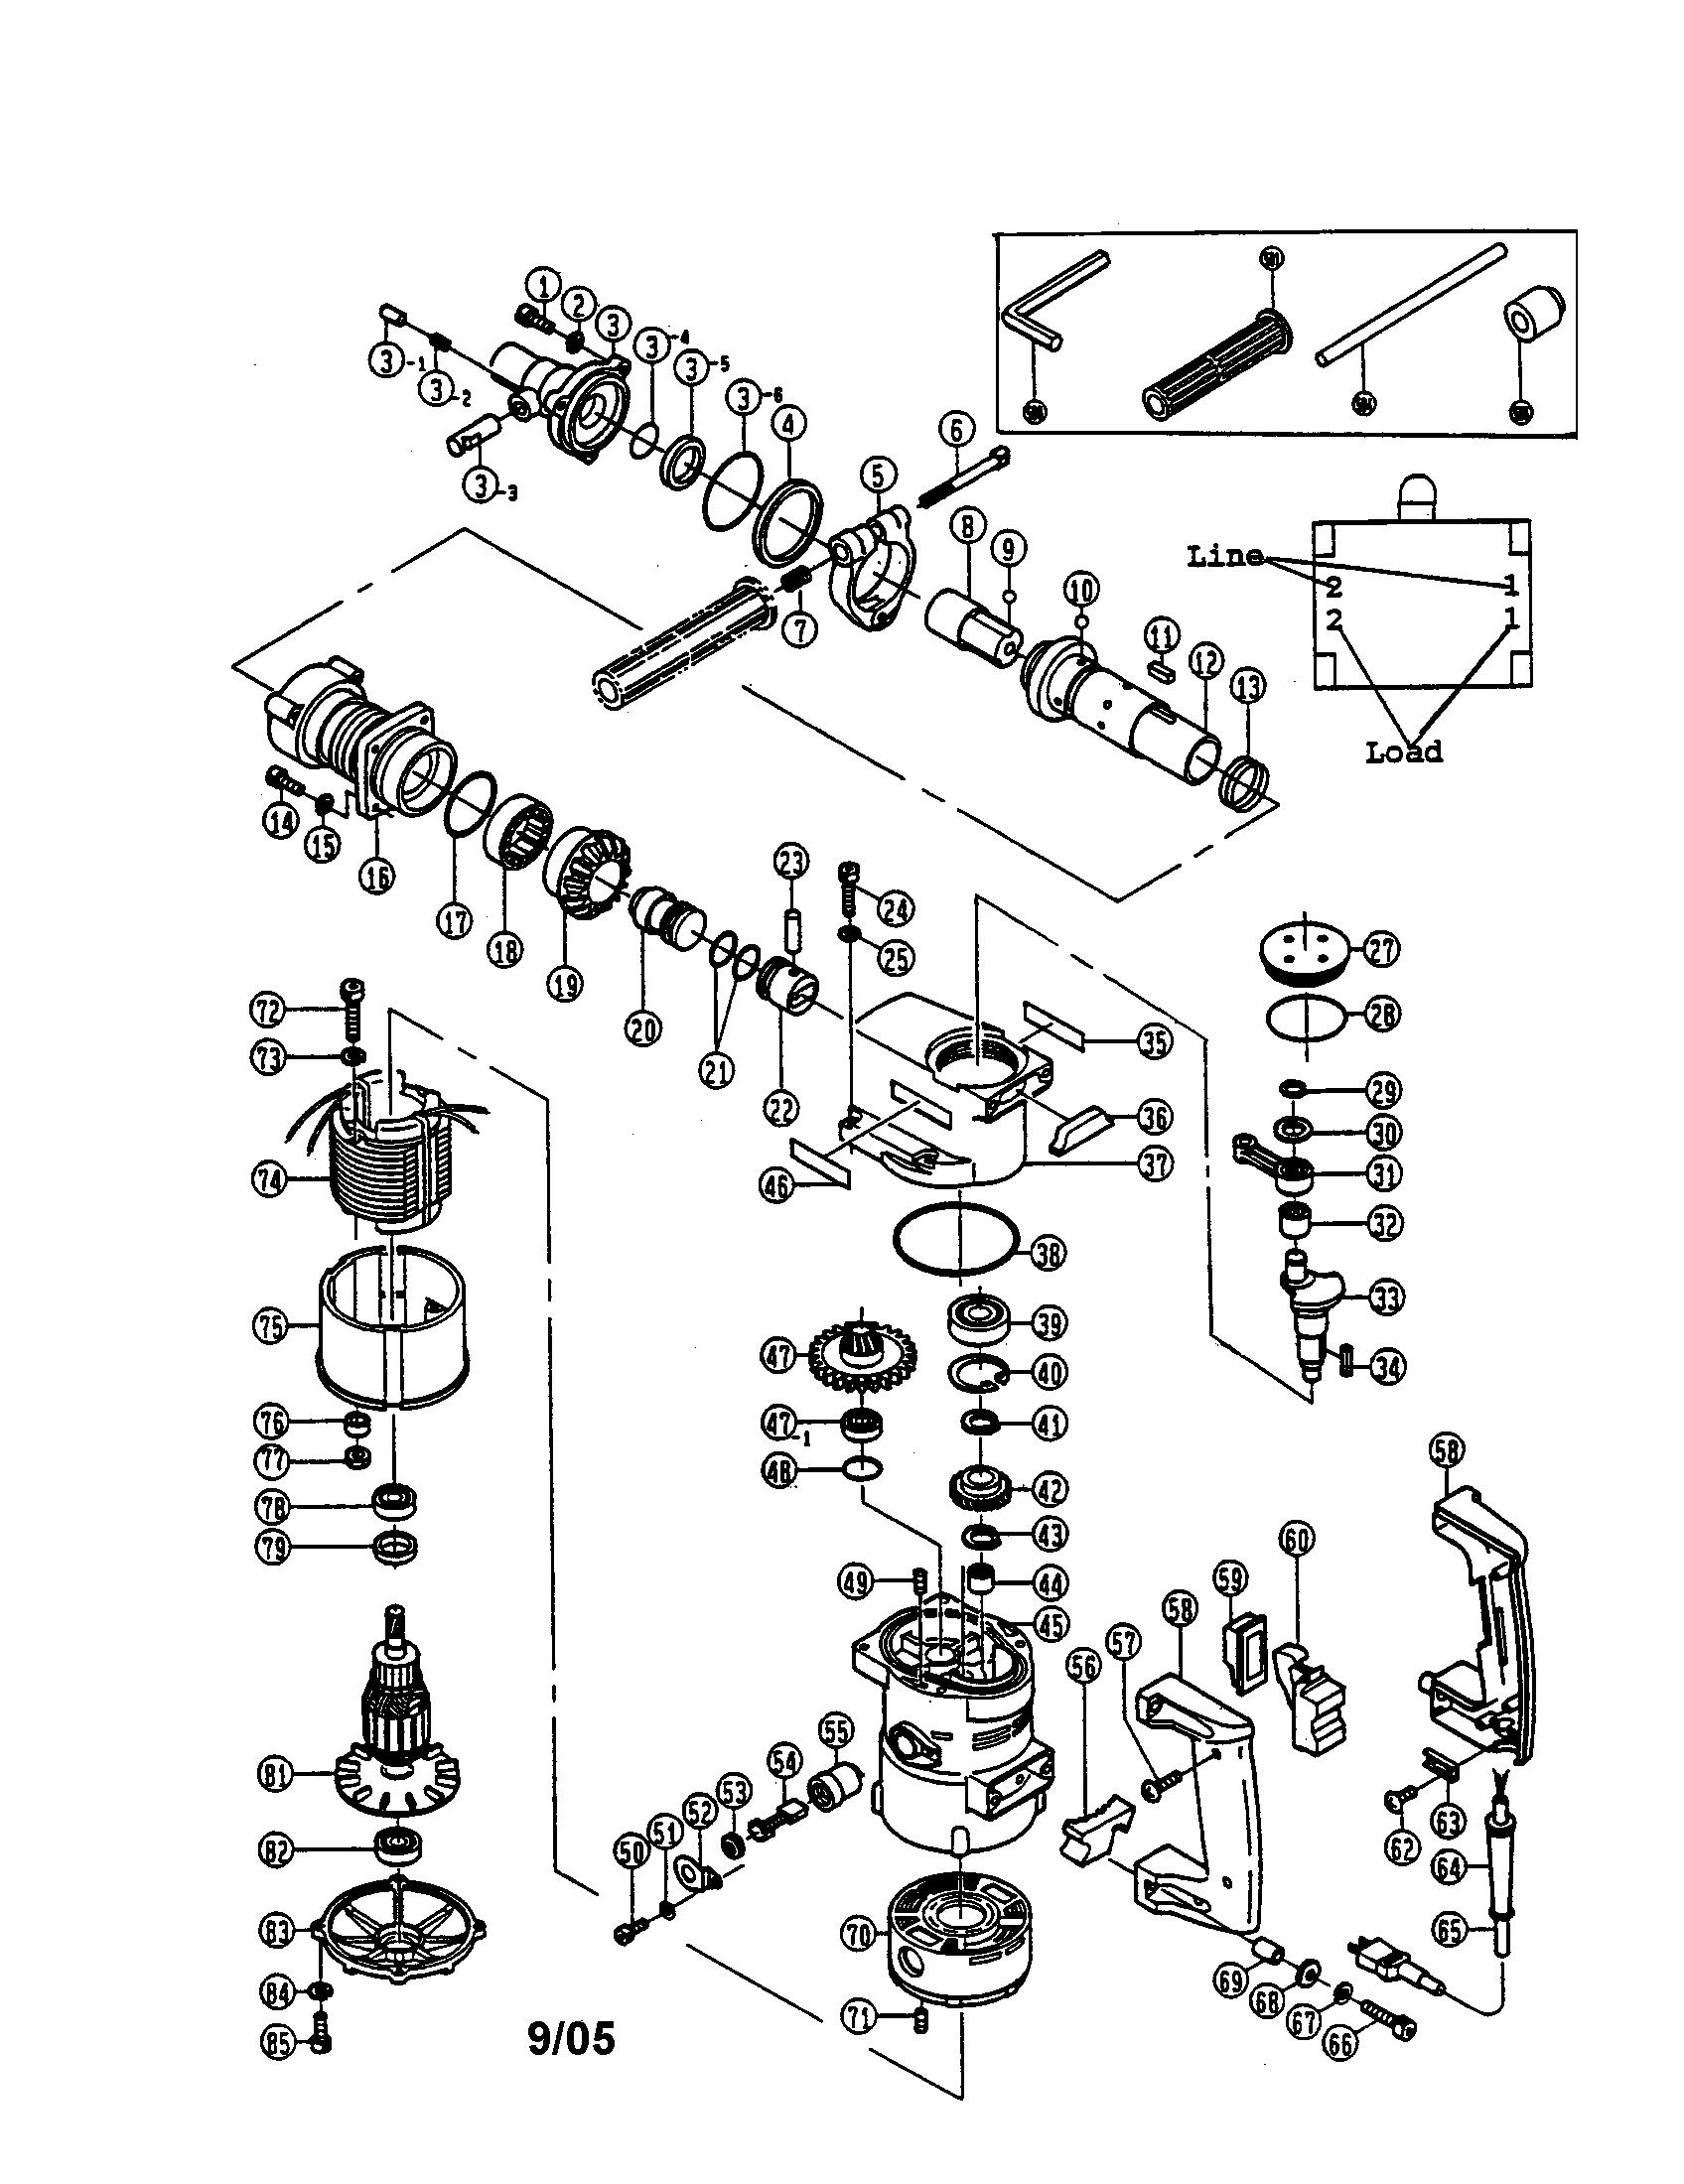 Ryobi model ED-382P rotary hammer genuine parts